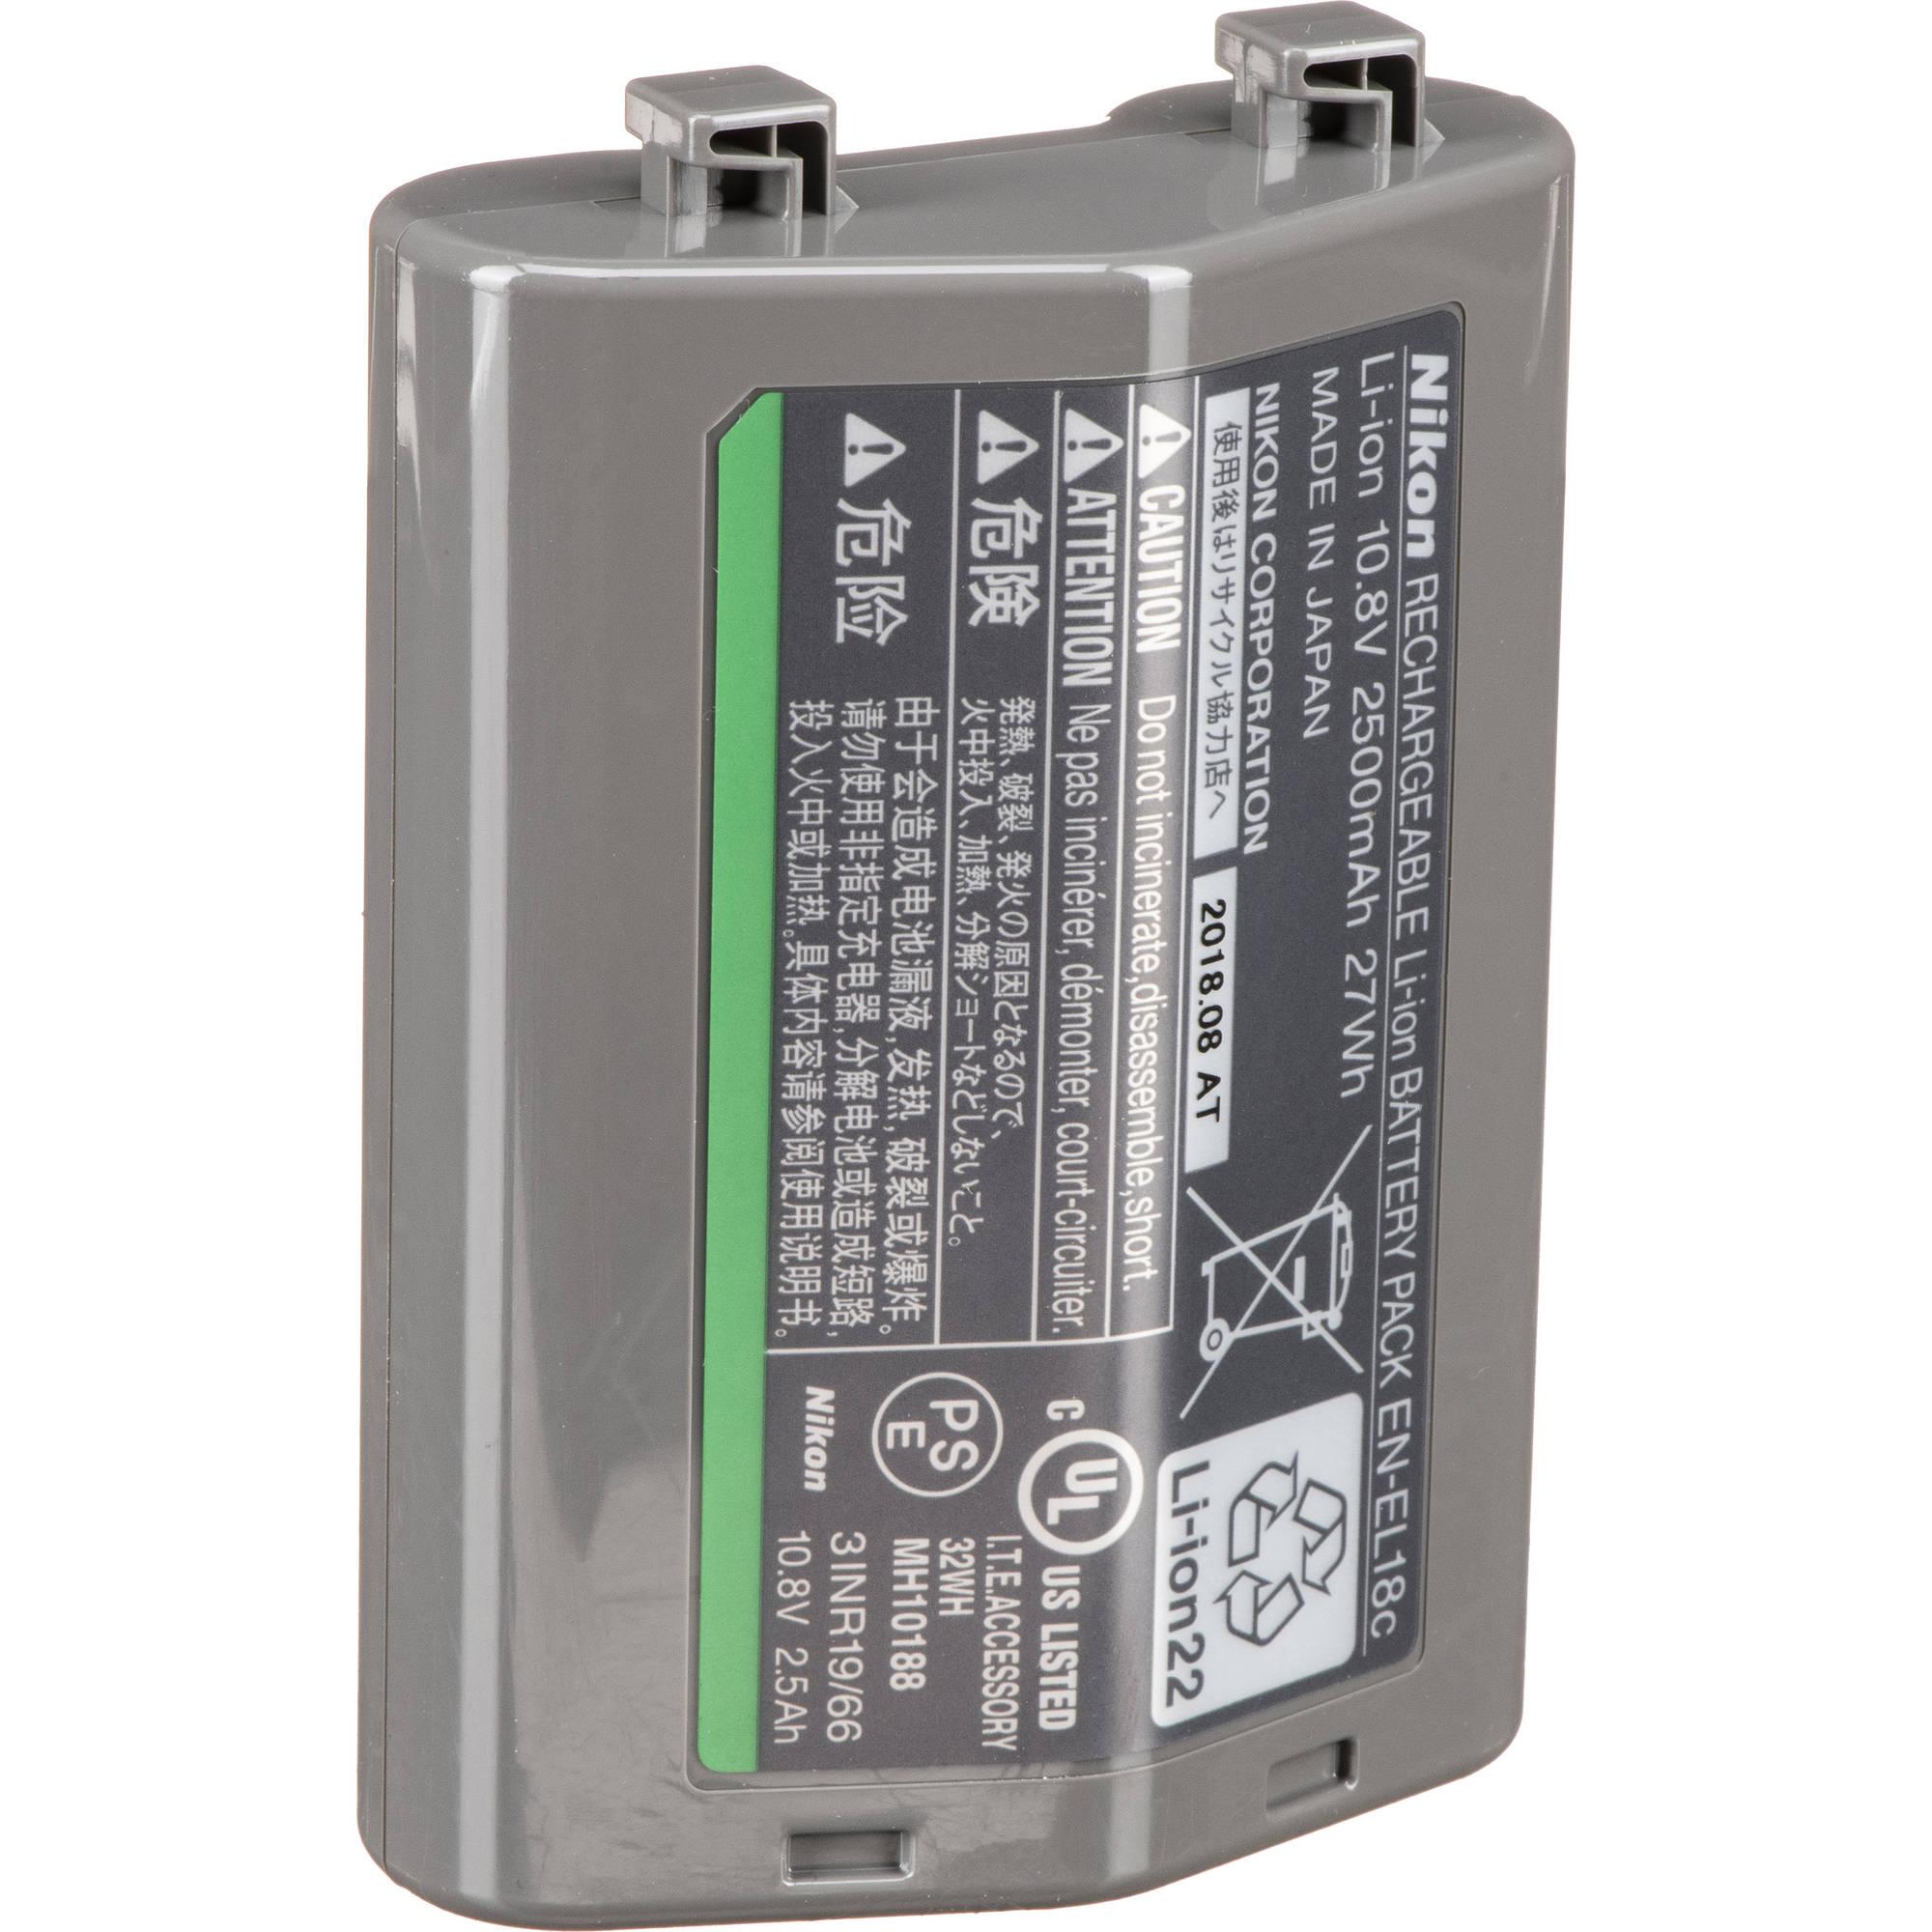 Nikon EN-EL 18c Rechargeable Lithium-Ion Battery (10 8V, 2500mAh)